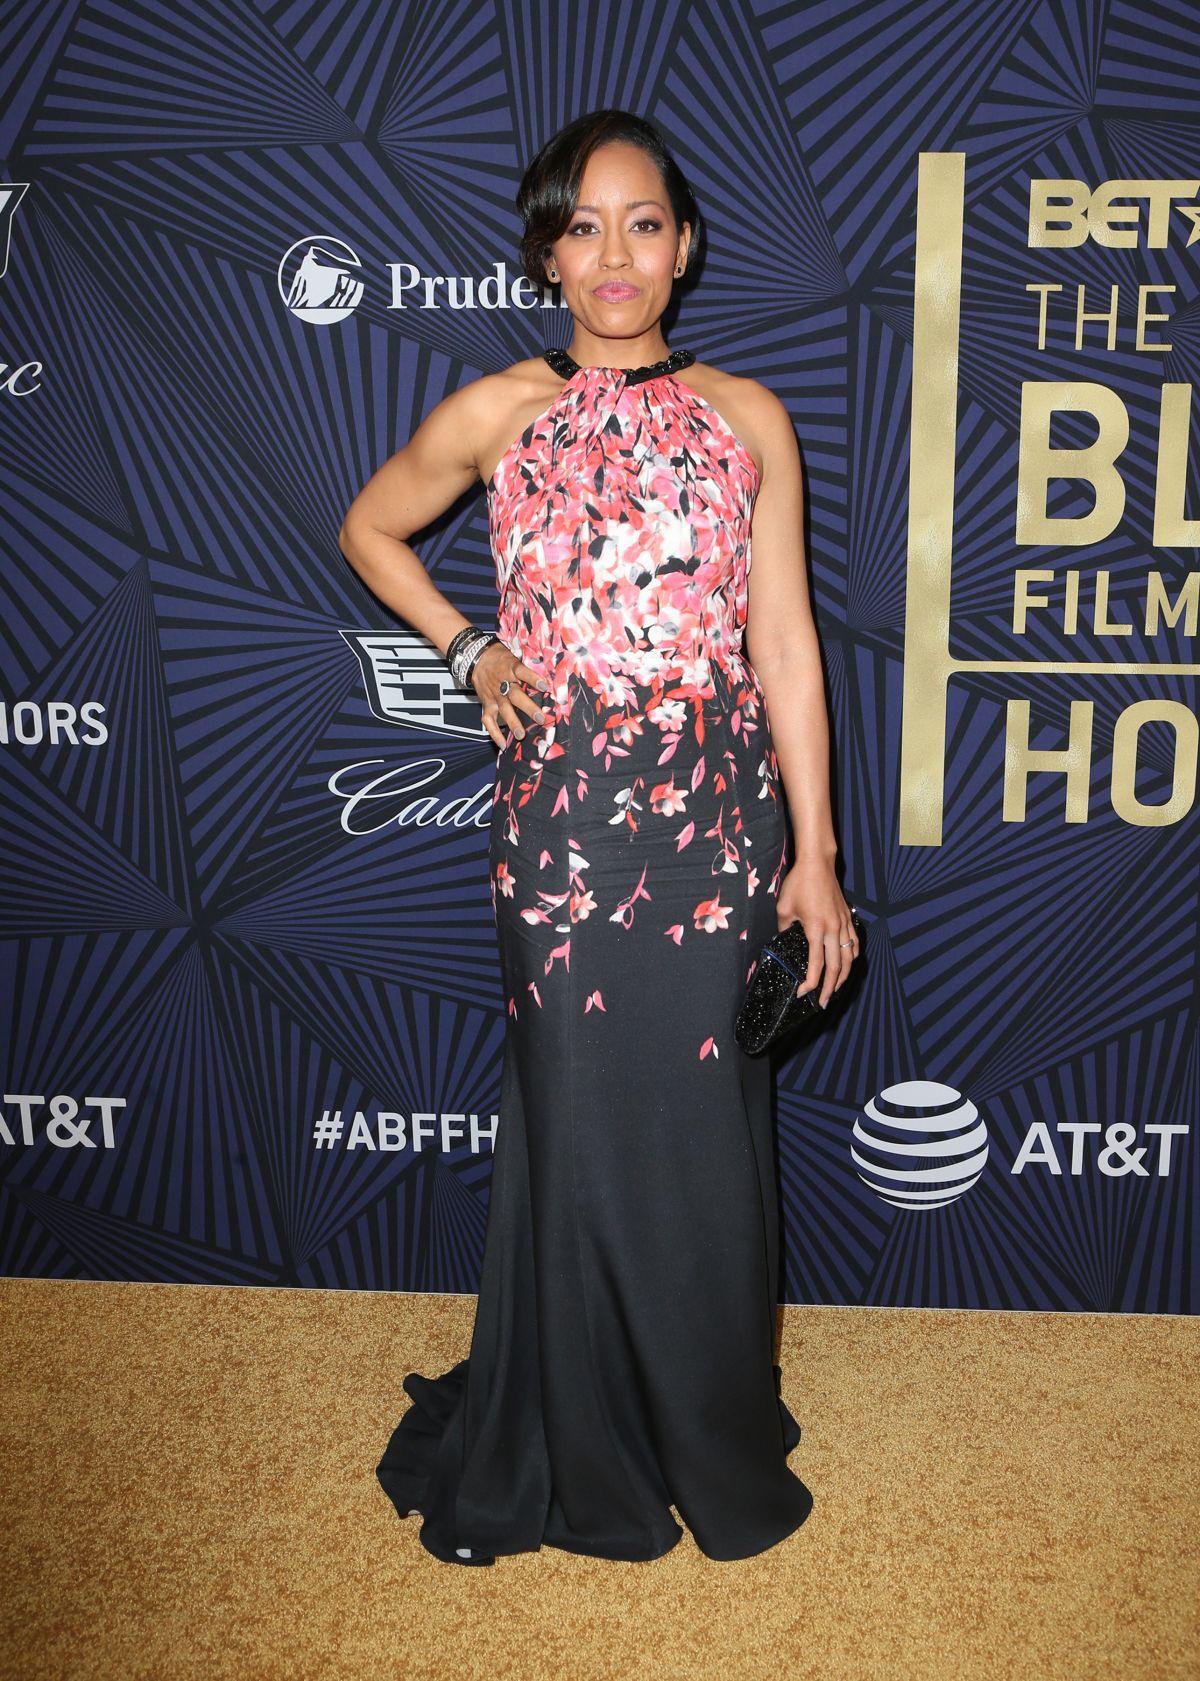 DAWN-LYEN GARDNER at Bet's 2017 American Black Film Festival Honors Awards in Beverly Hills 02/17/2017